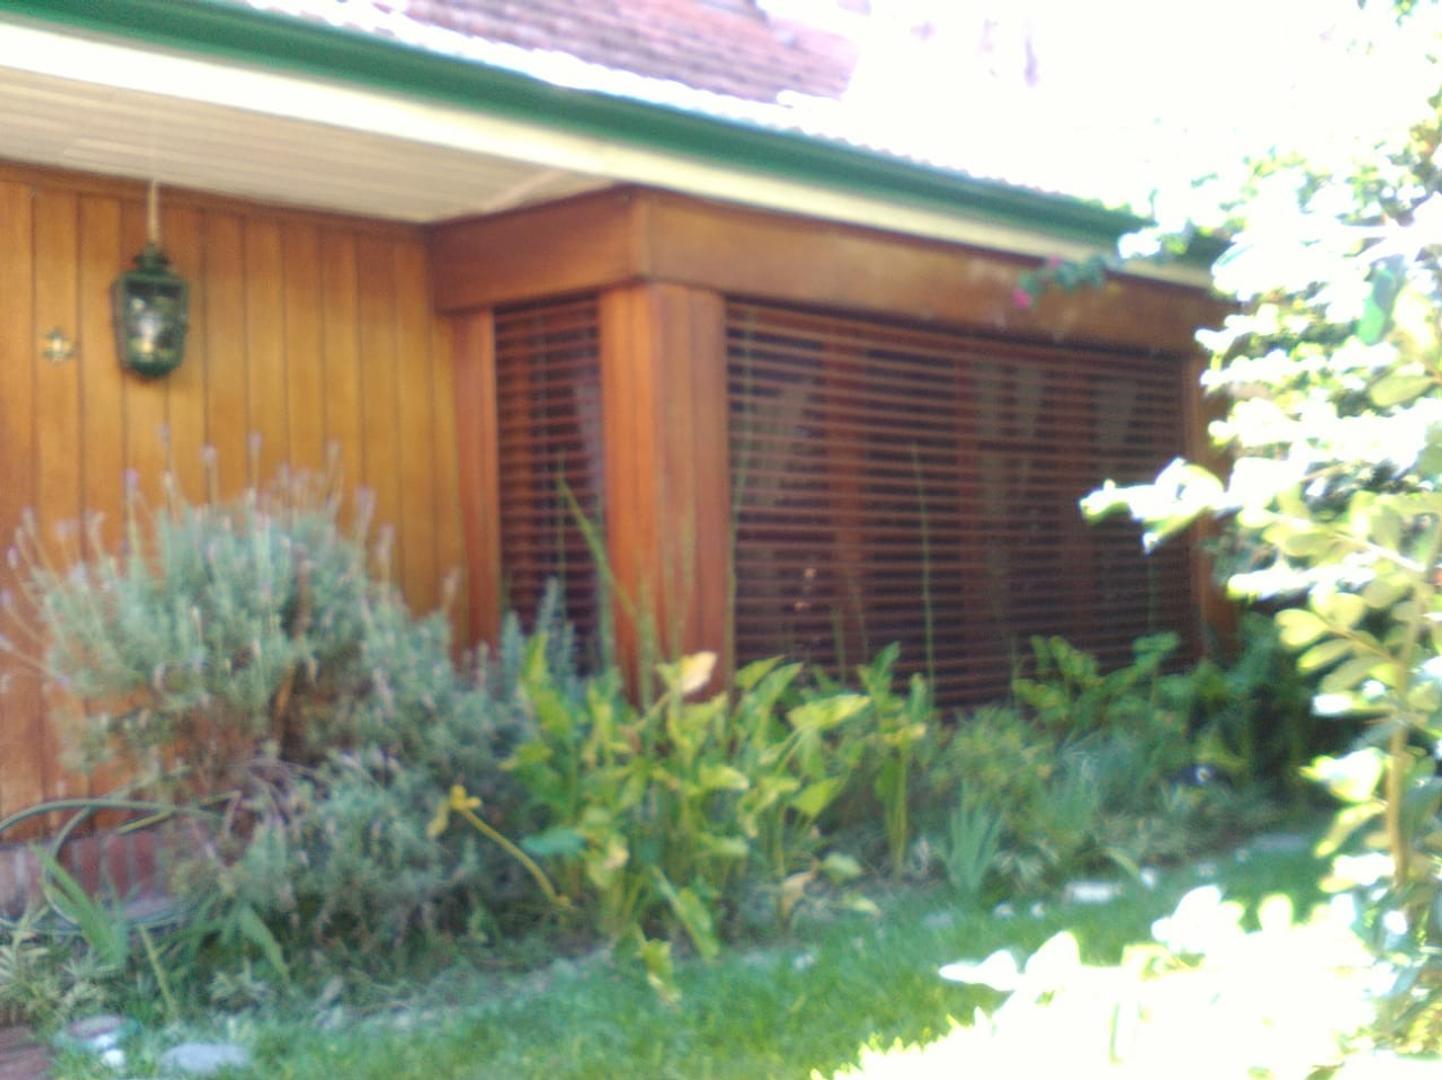 Casa en Alquiler en Quilmes - 5 ambientes